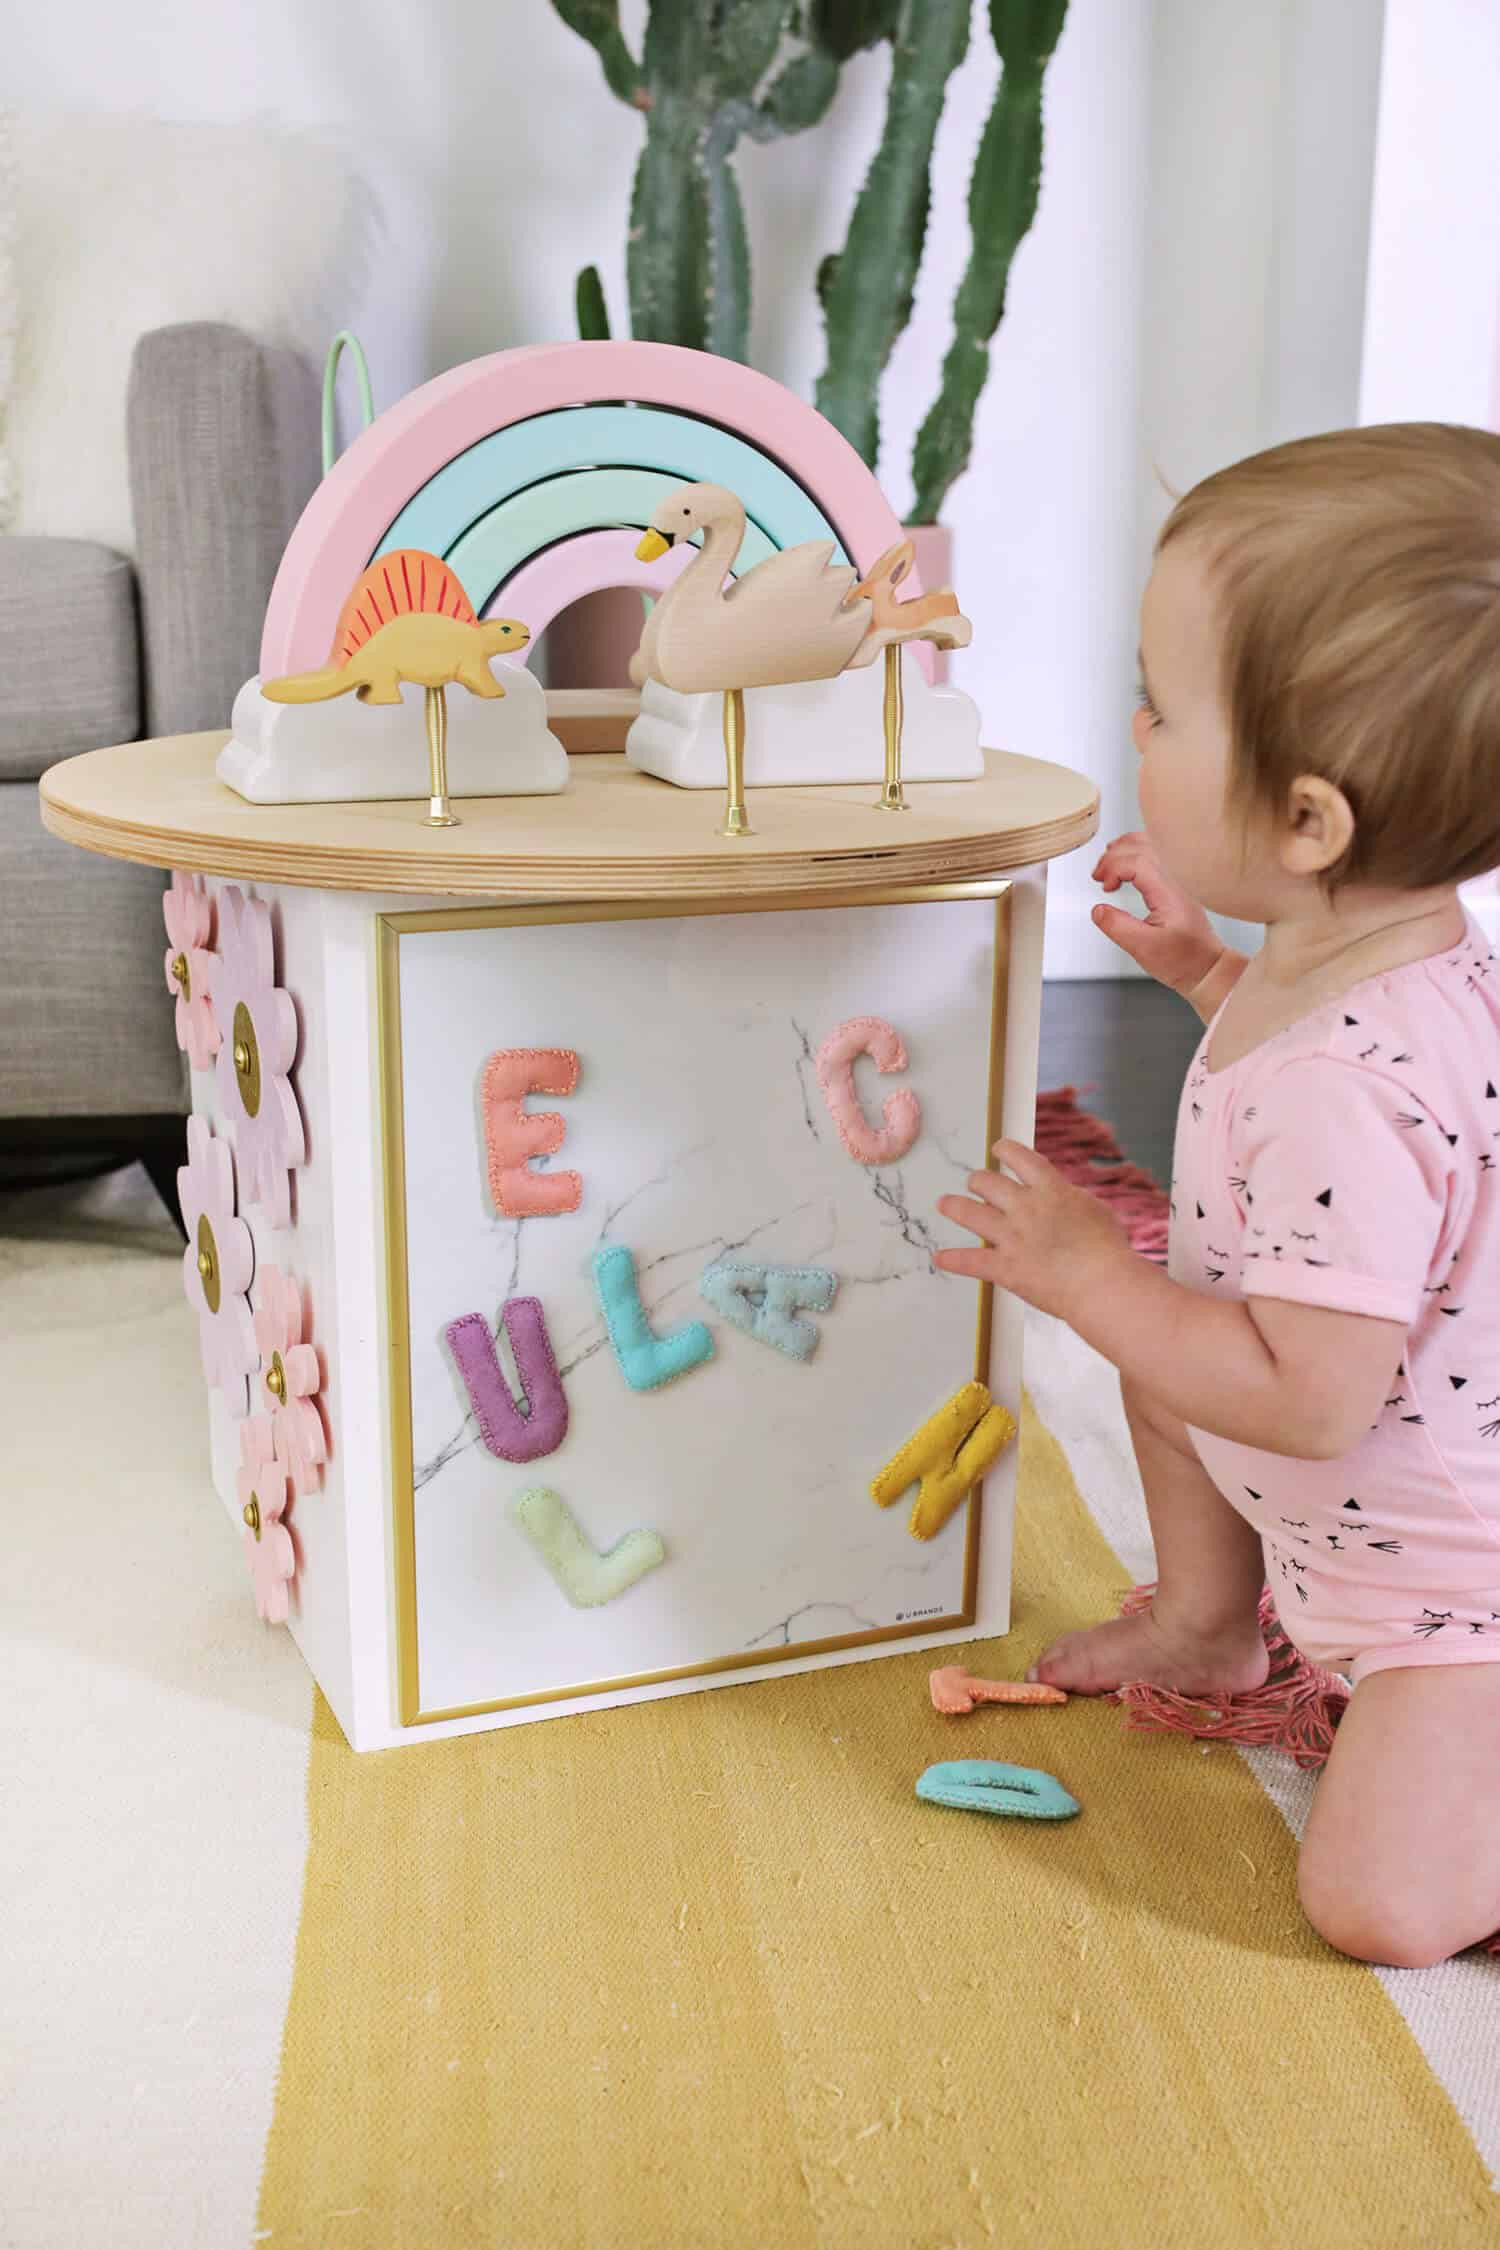 Best ideas about DIY Toddler Activities . Save or Pin Toddler Activity Center DIY A Beautiful Mess Now.